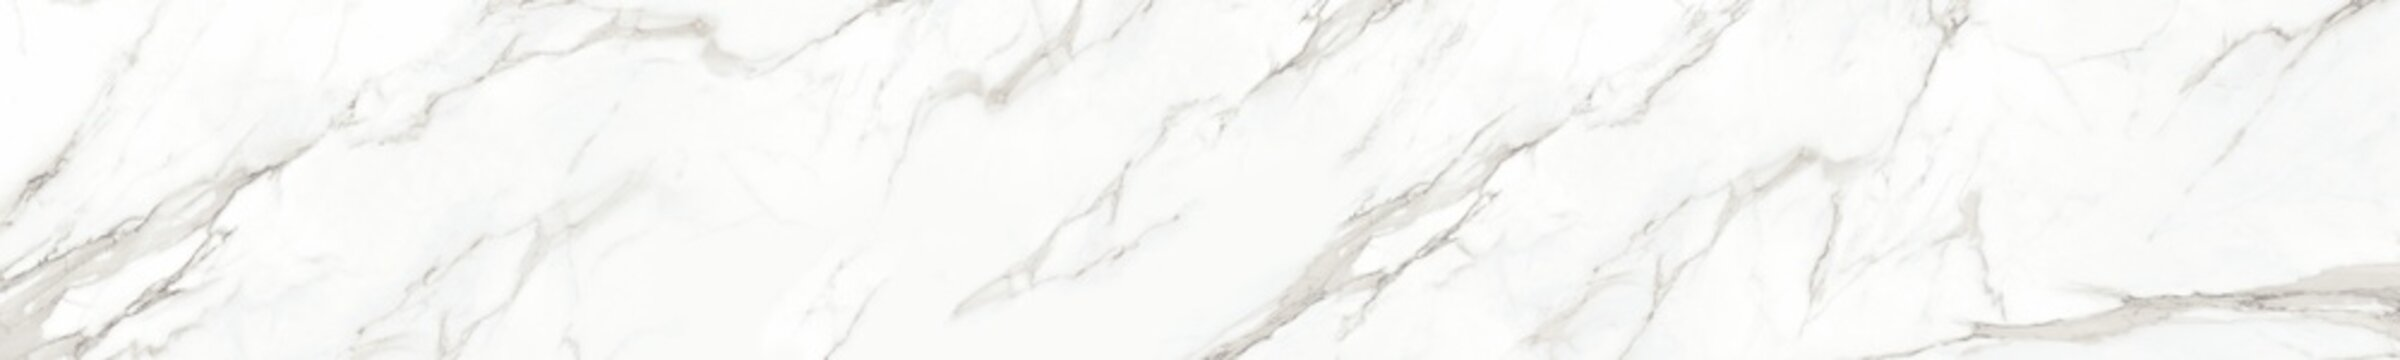 Panorama of white marble stone